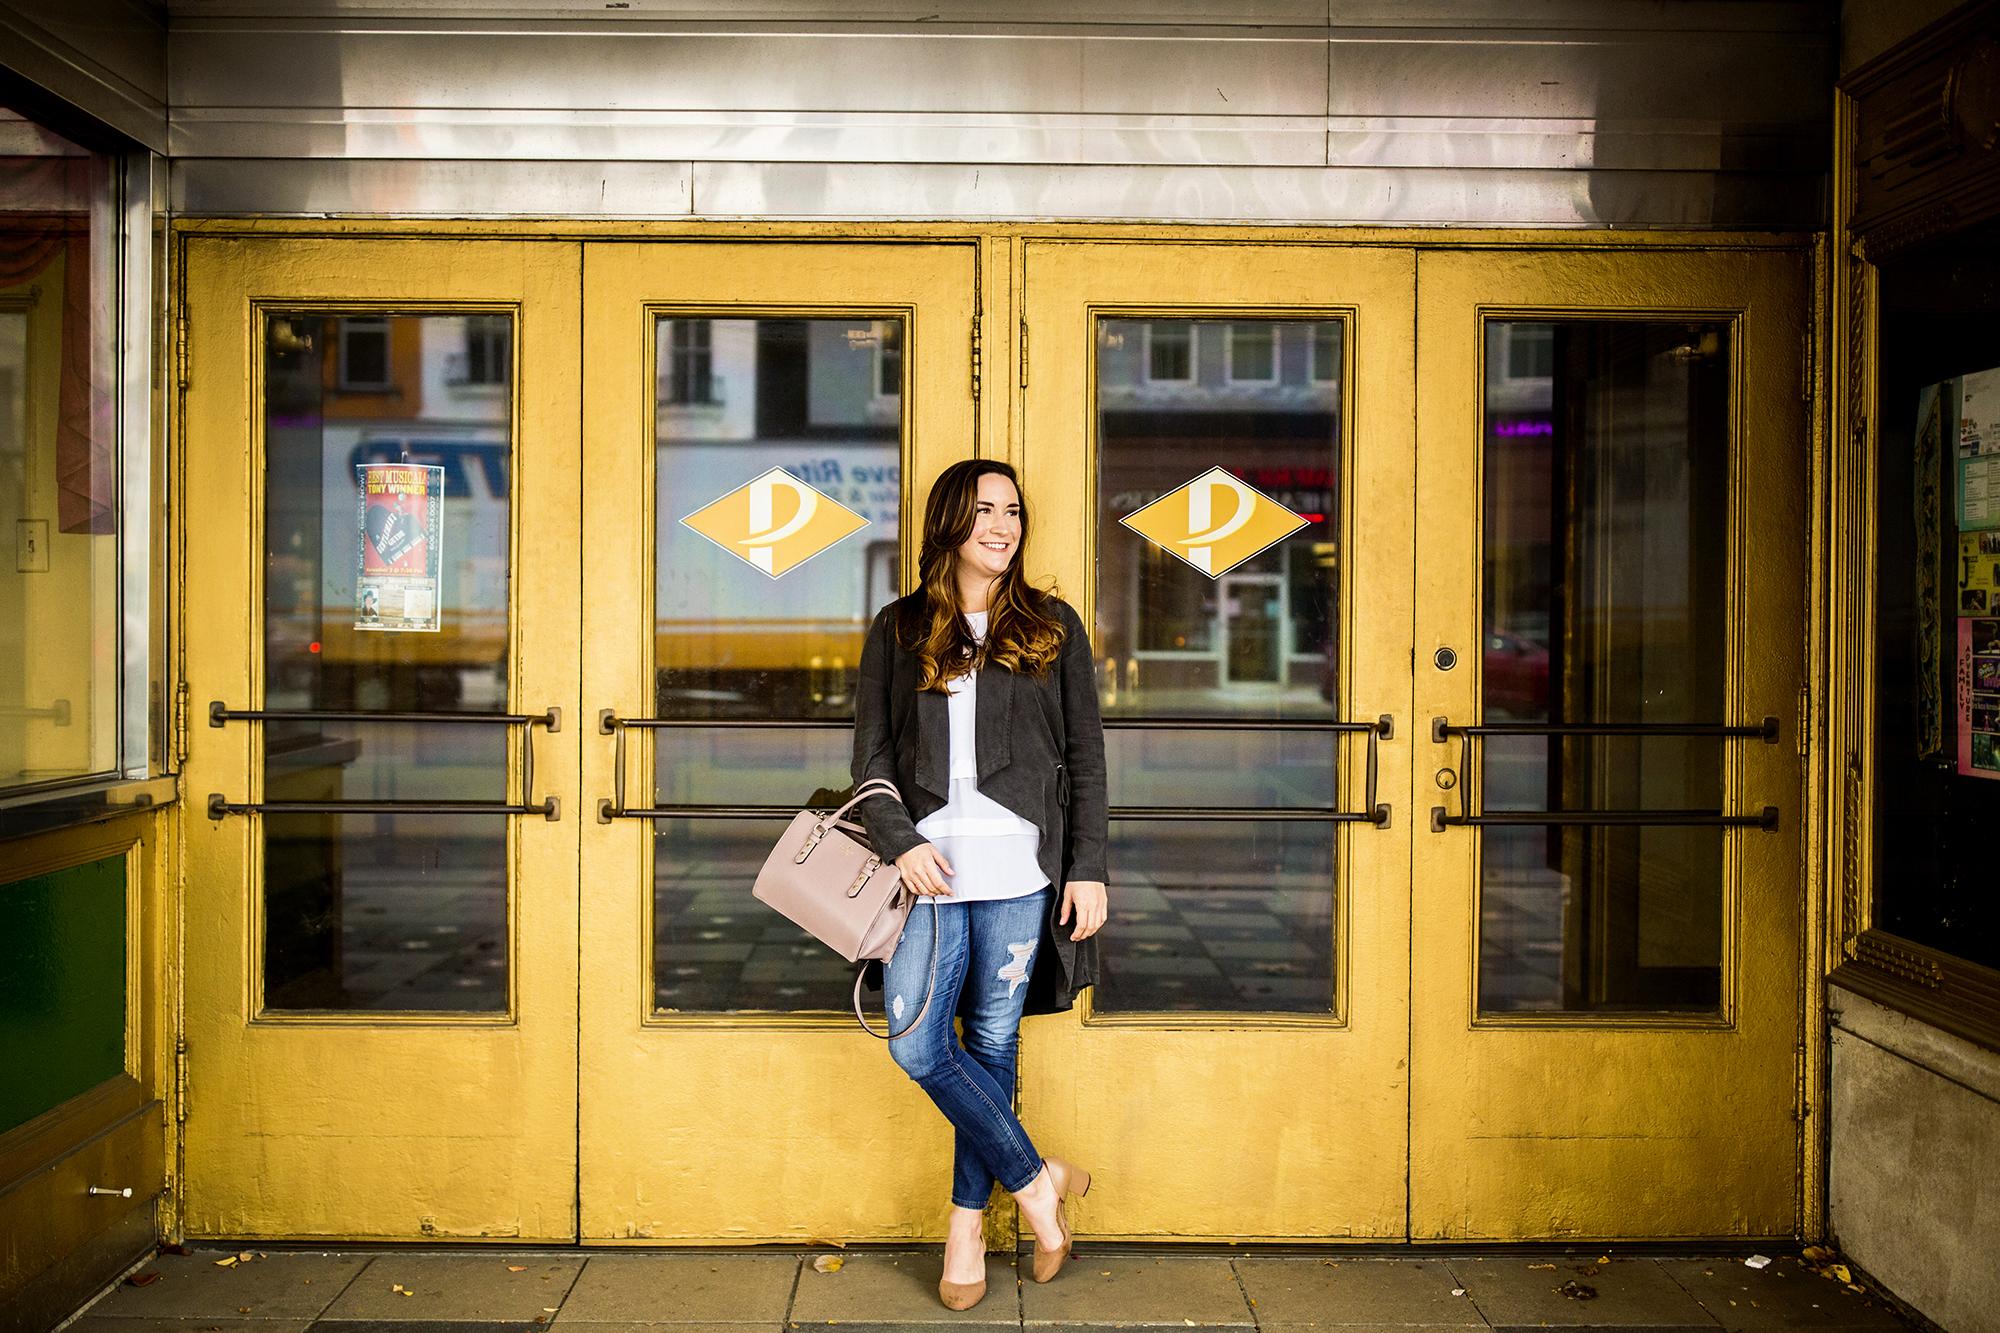 Seriously_Sabrina_Photography_Ashland_Kentucky_Fashion_Blogger_Portraits_LaurenFannin1.jpg